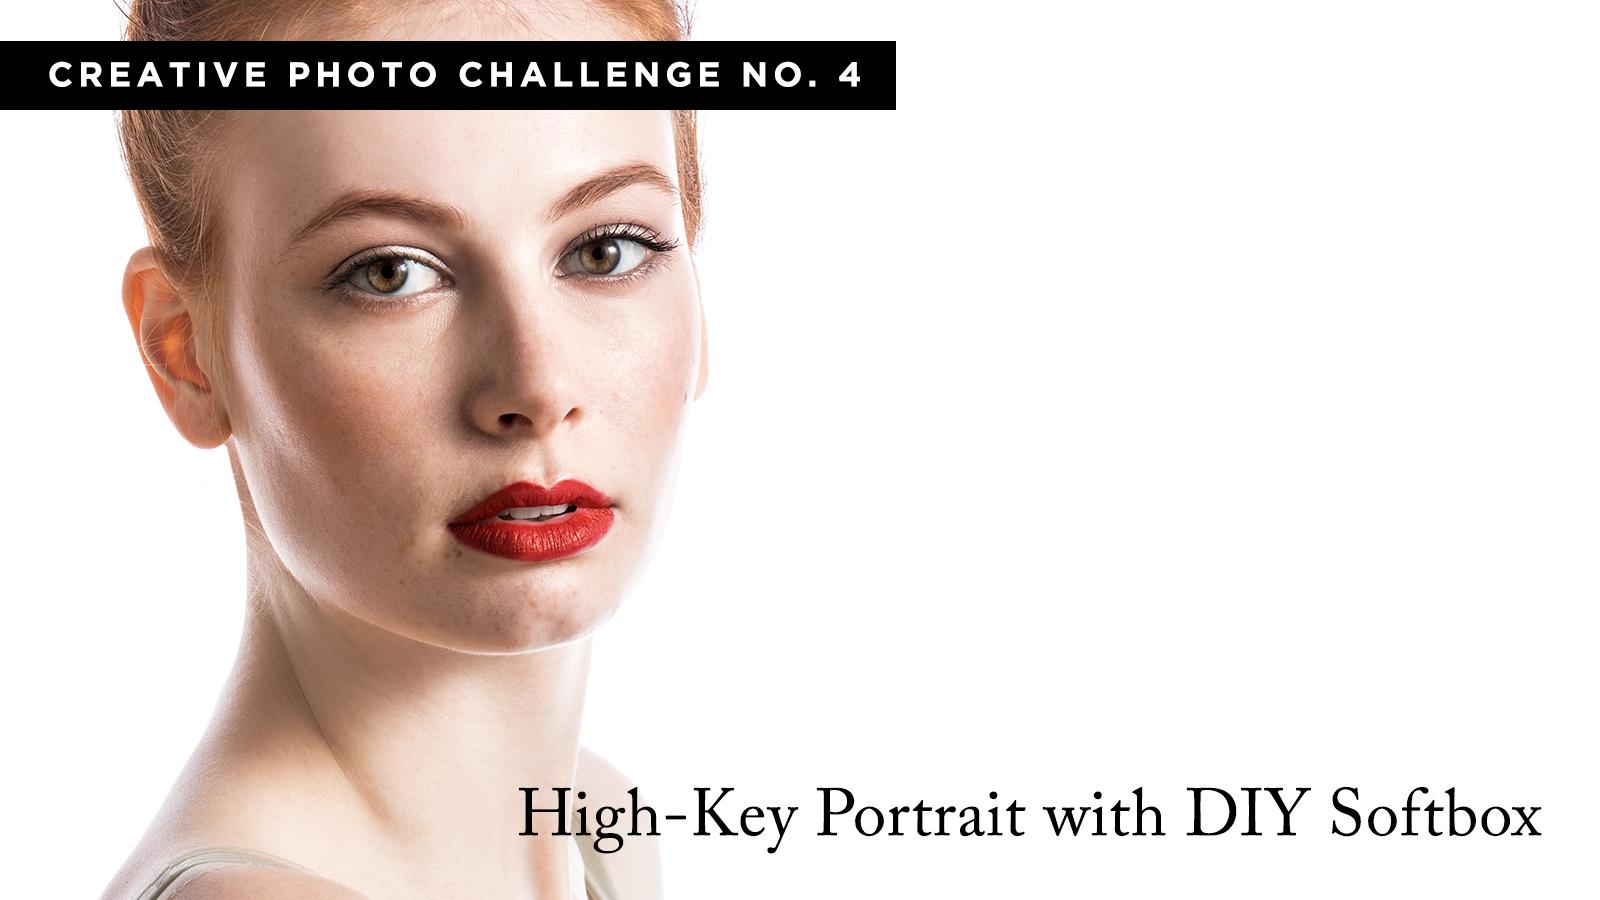 Creative Photo Challenge No. 4 - High-Key Portraits (w/ DIY Softbox)